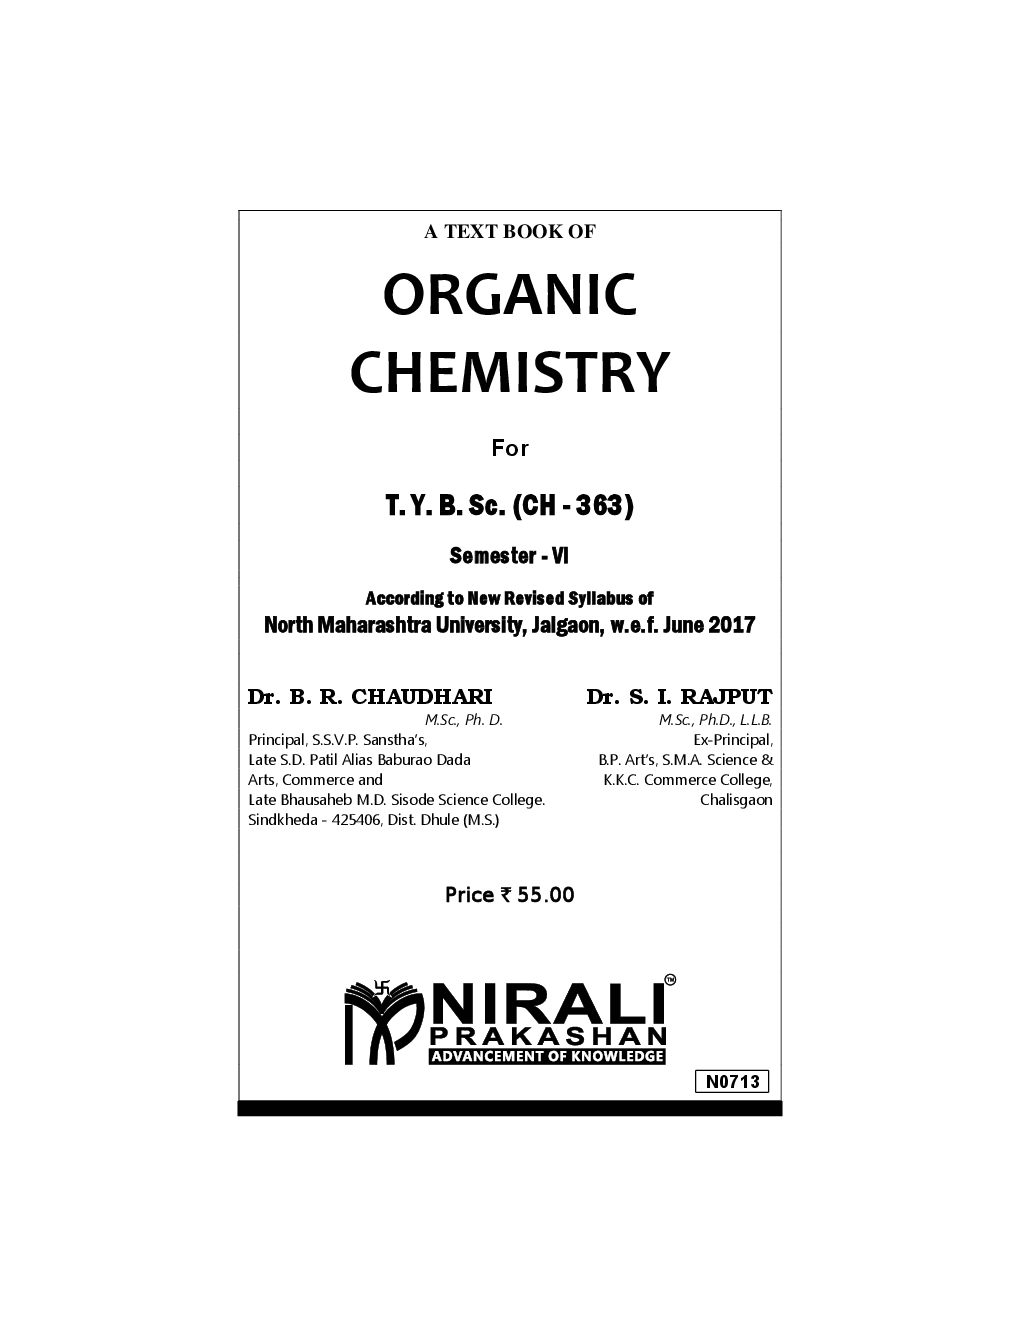 Download Organic Chemistry PDF Online by Dr. B. R